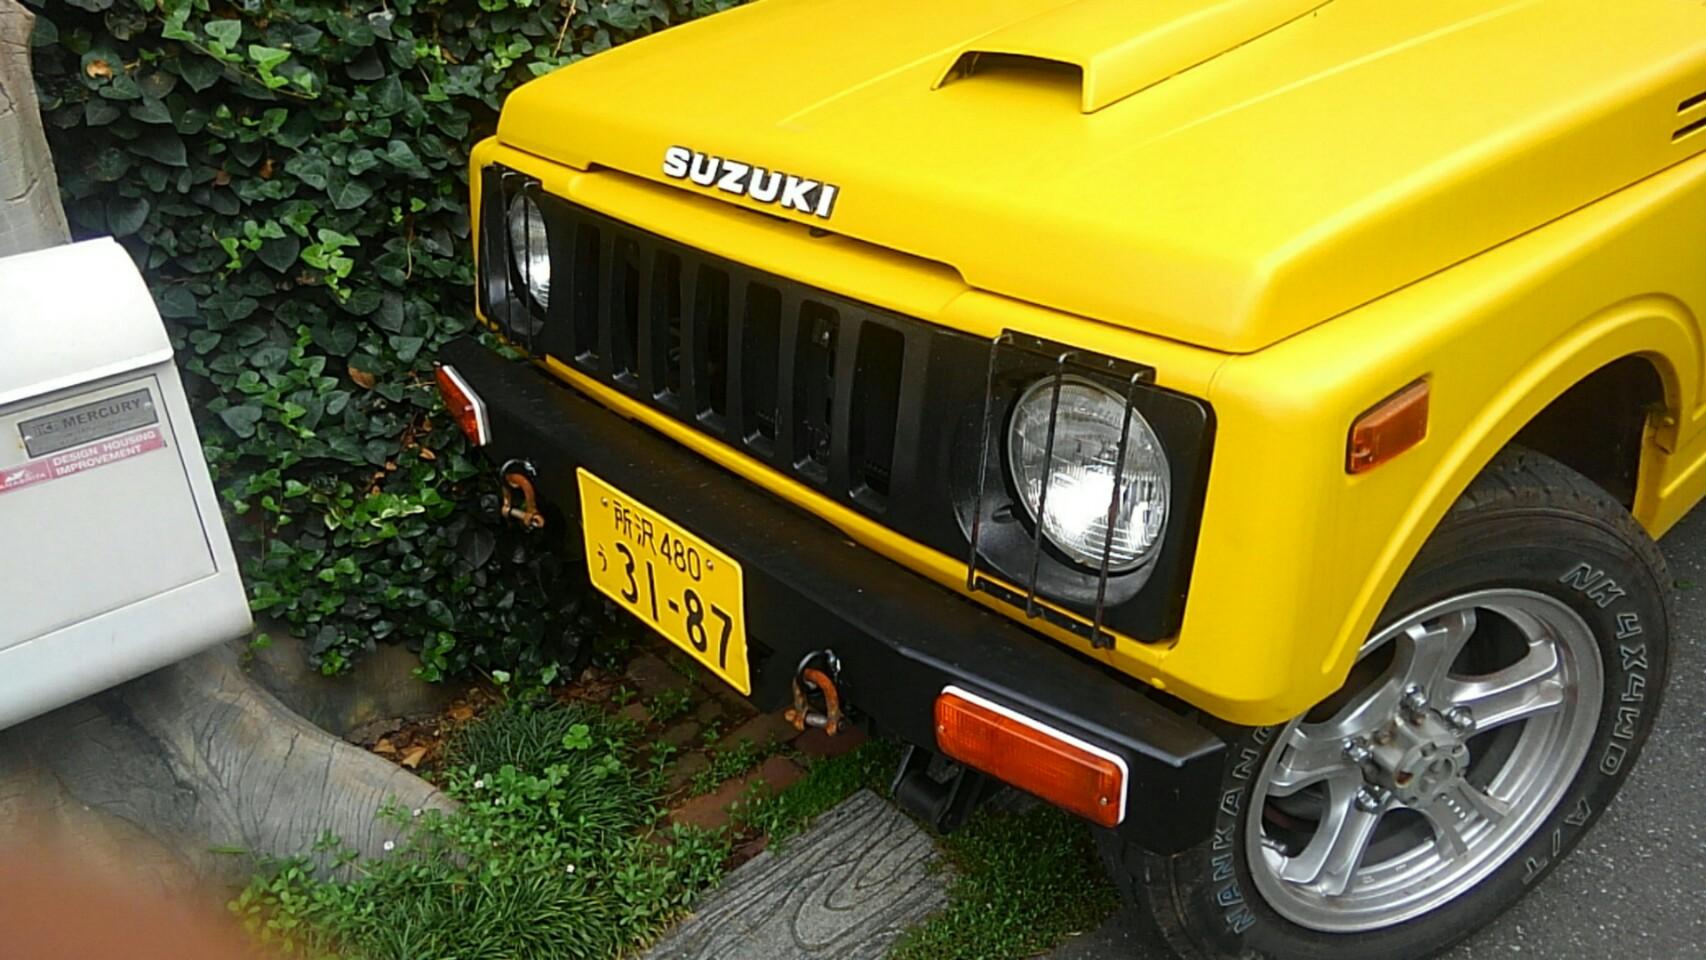 KIMG4668_2.jpg